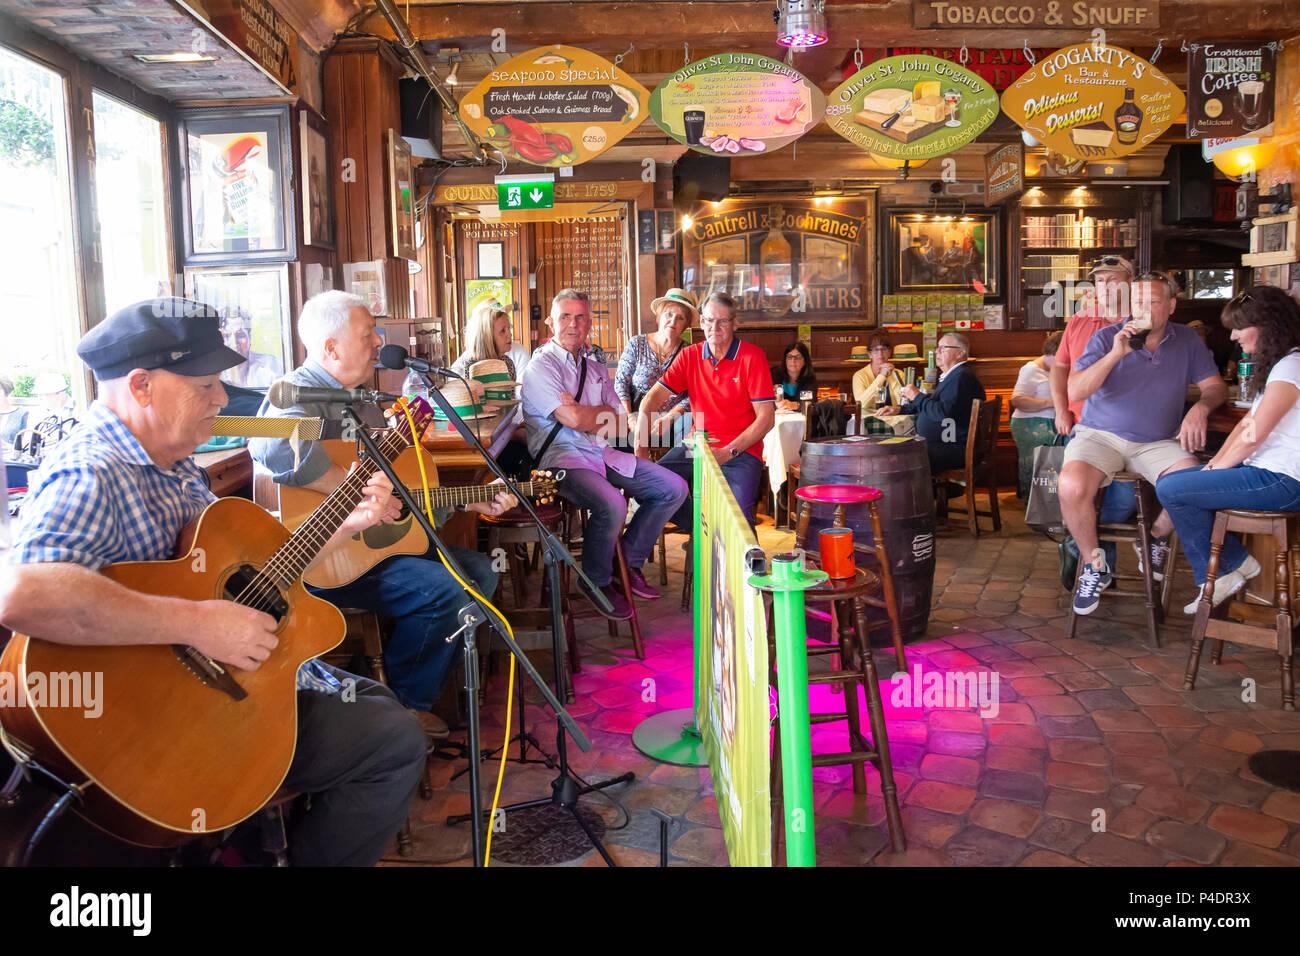 Live music in Oliver St John Gogartys traditional Irish Bar, Anglesea Street,Temple Bar, Dublin, Leinster Province, Republic of Ireland - Stock Image